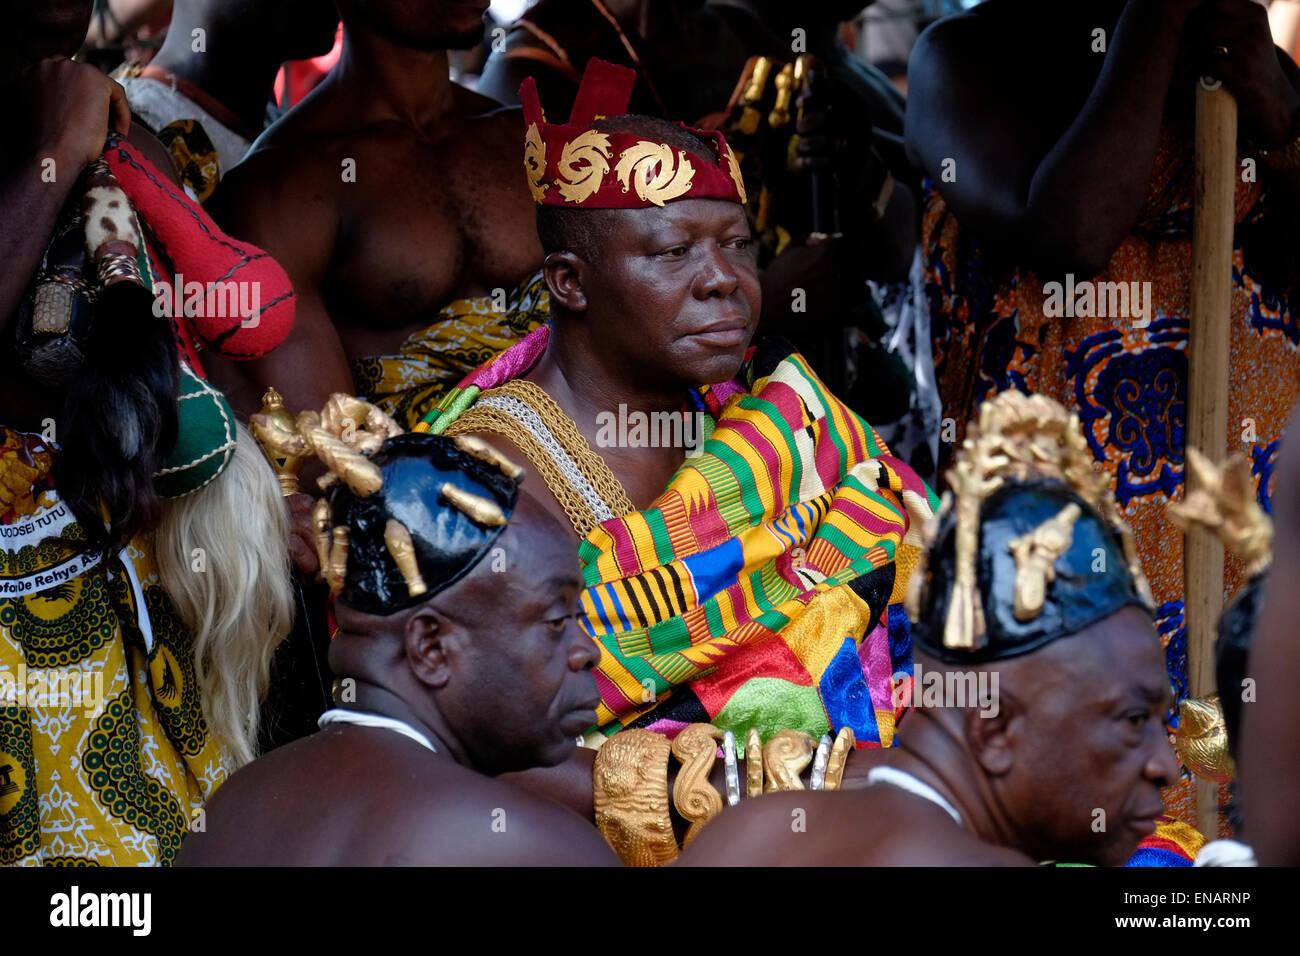 Otumfuo Nana Osei Tutu II the 16th King Asantehene traditional ruler of the  Kingdom of Ashanti